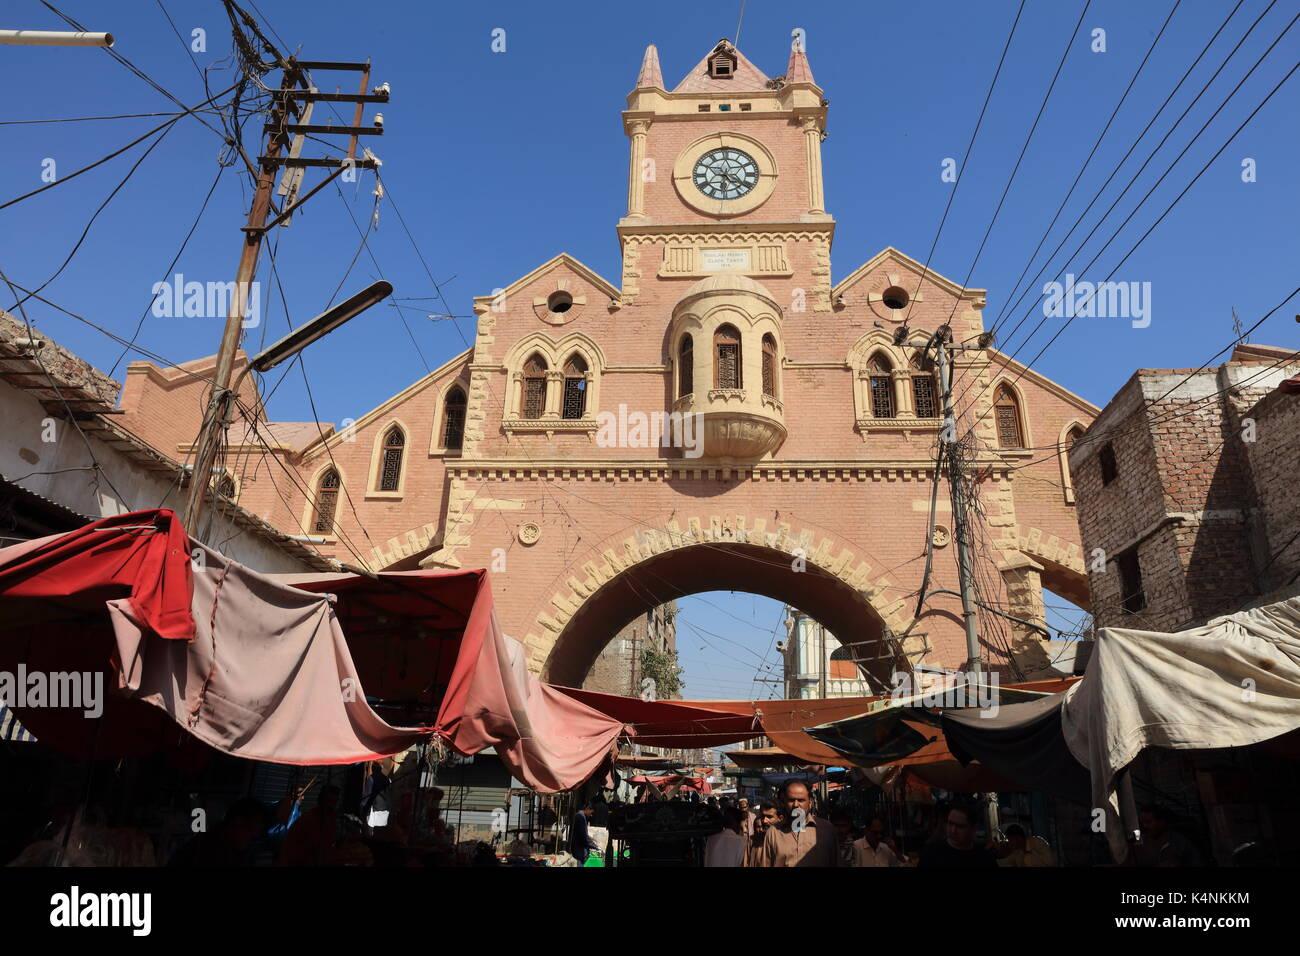 Clock Tower Hyderabad, Pakistan Stock Photo: 157828376 - Alamy